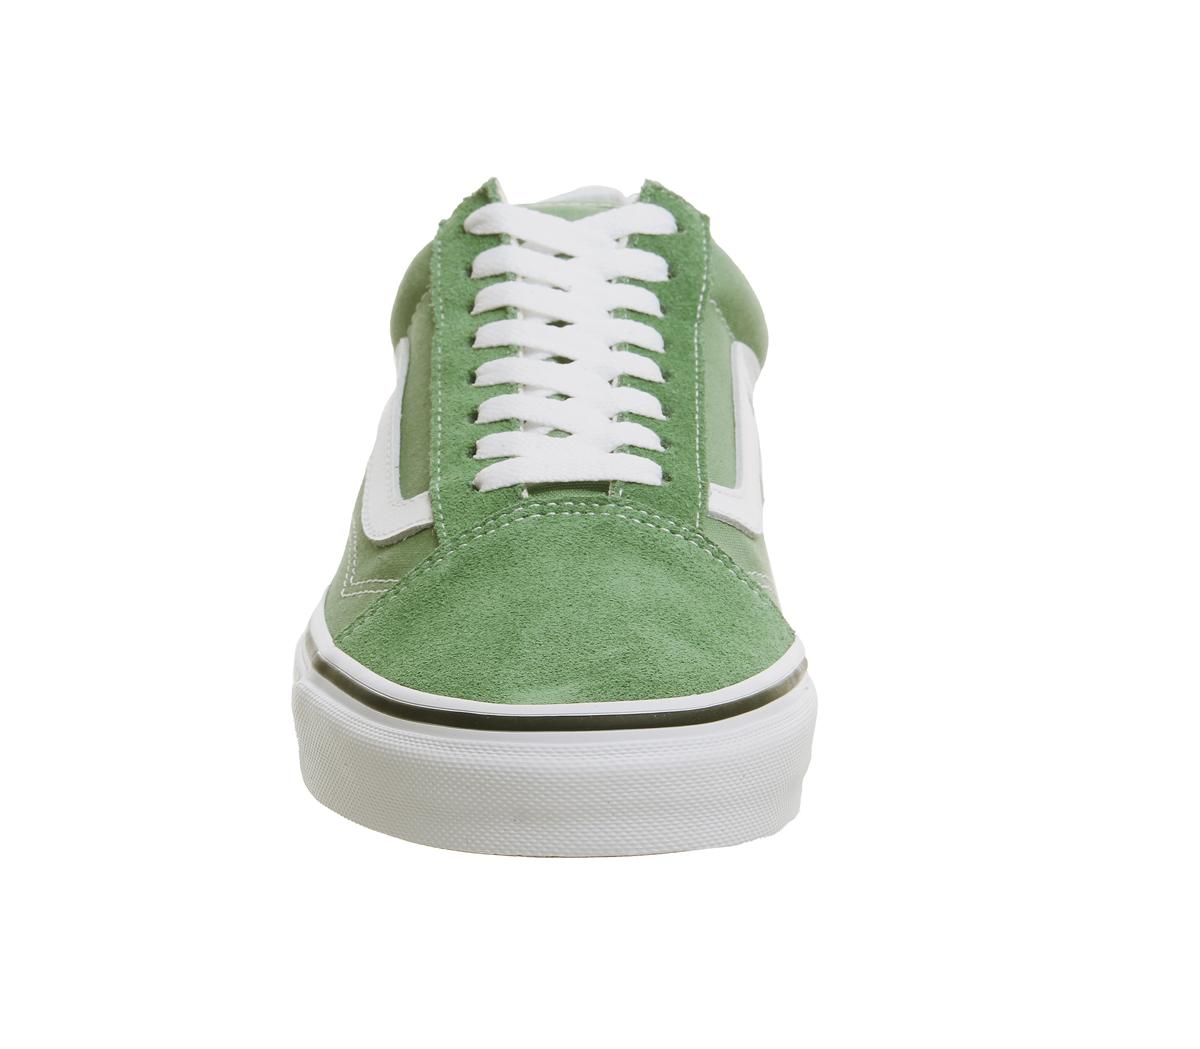 b005e9f21176ca Mens Vans Old Skool Trainers Deep Grass Green True White Trainers ...